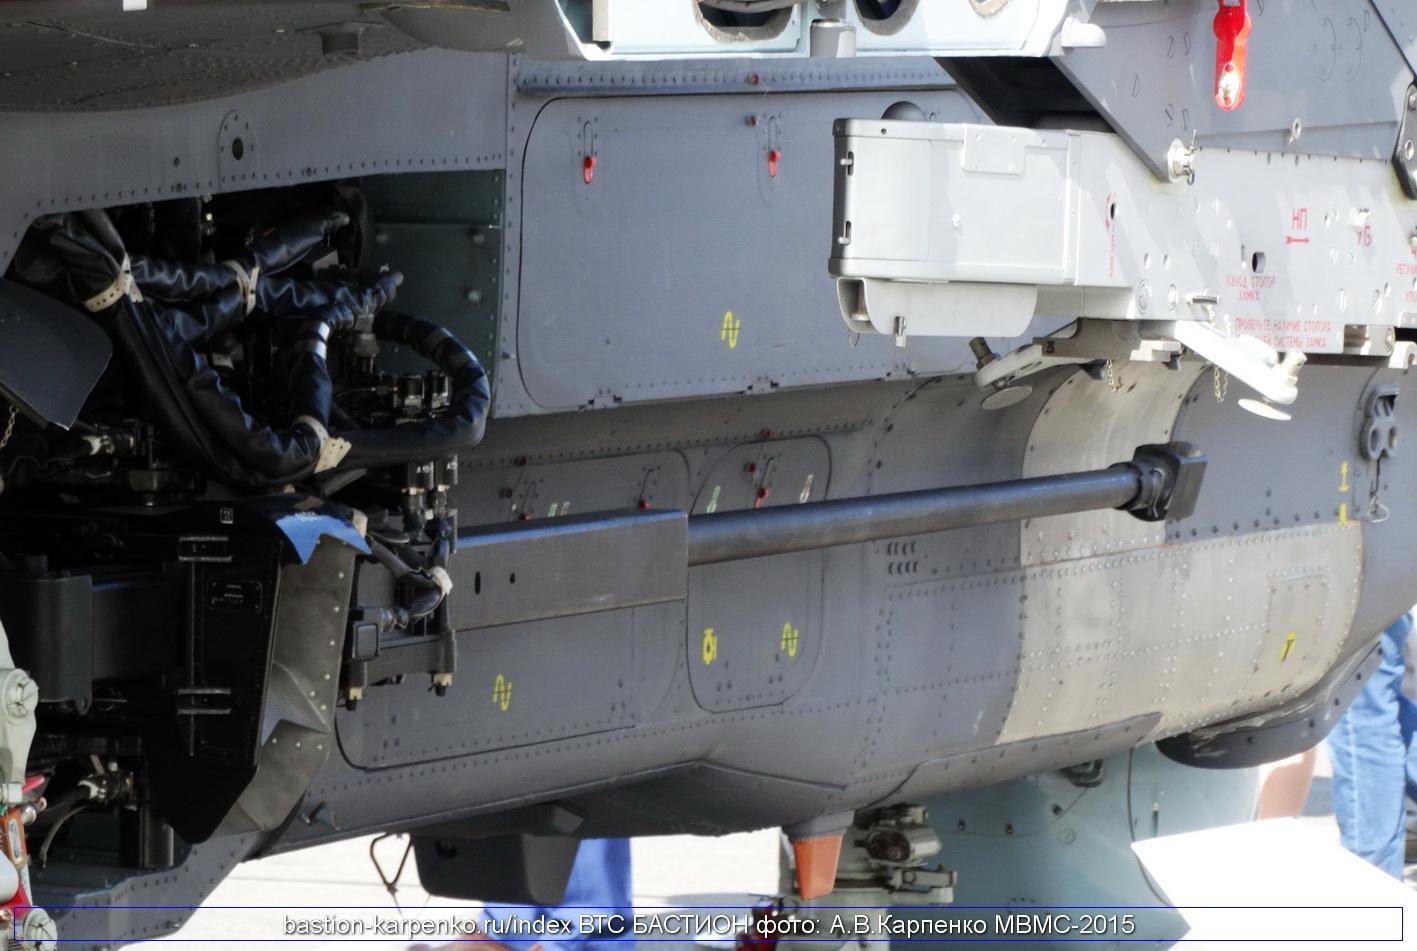 Ka-52K for Russian Navy - Page 2 KA-52K_MVMS-2015_37